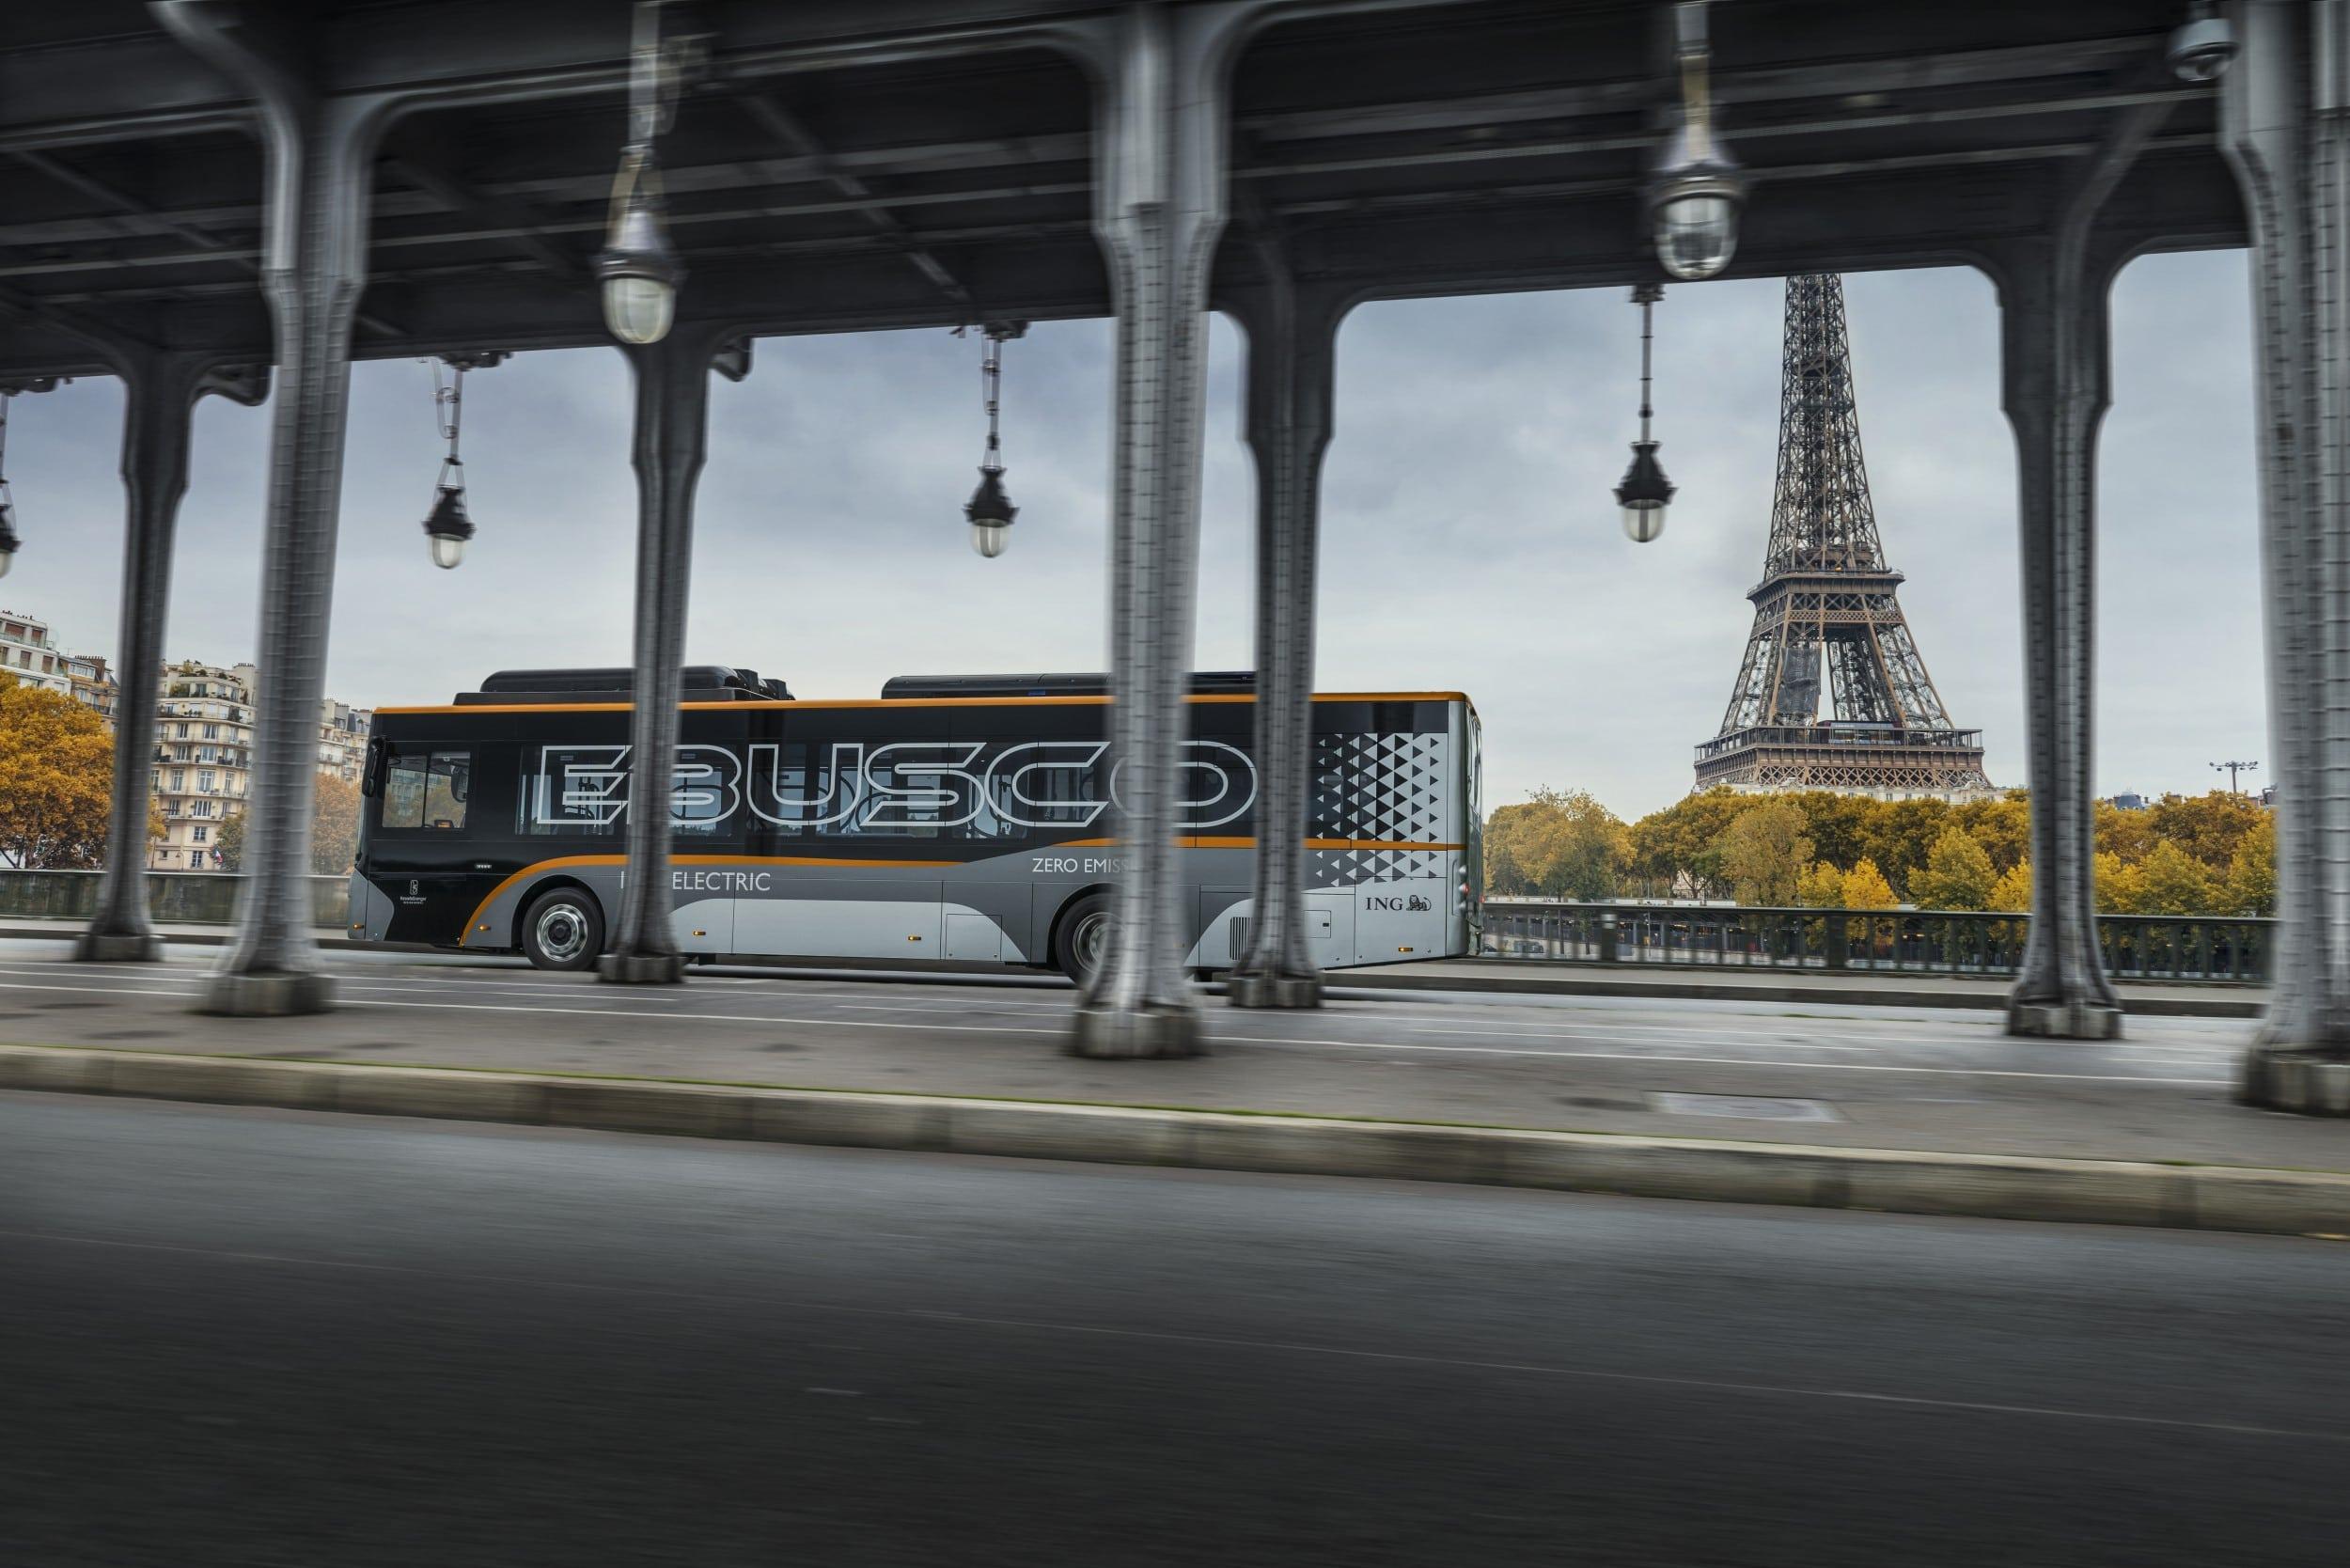 Ebusco bus in Paris with Eiffel Tower